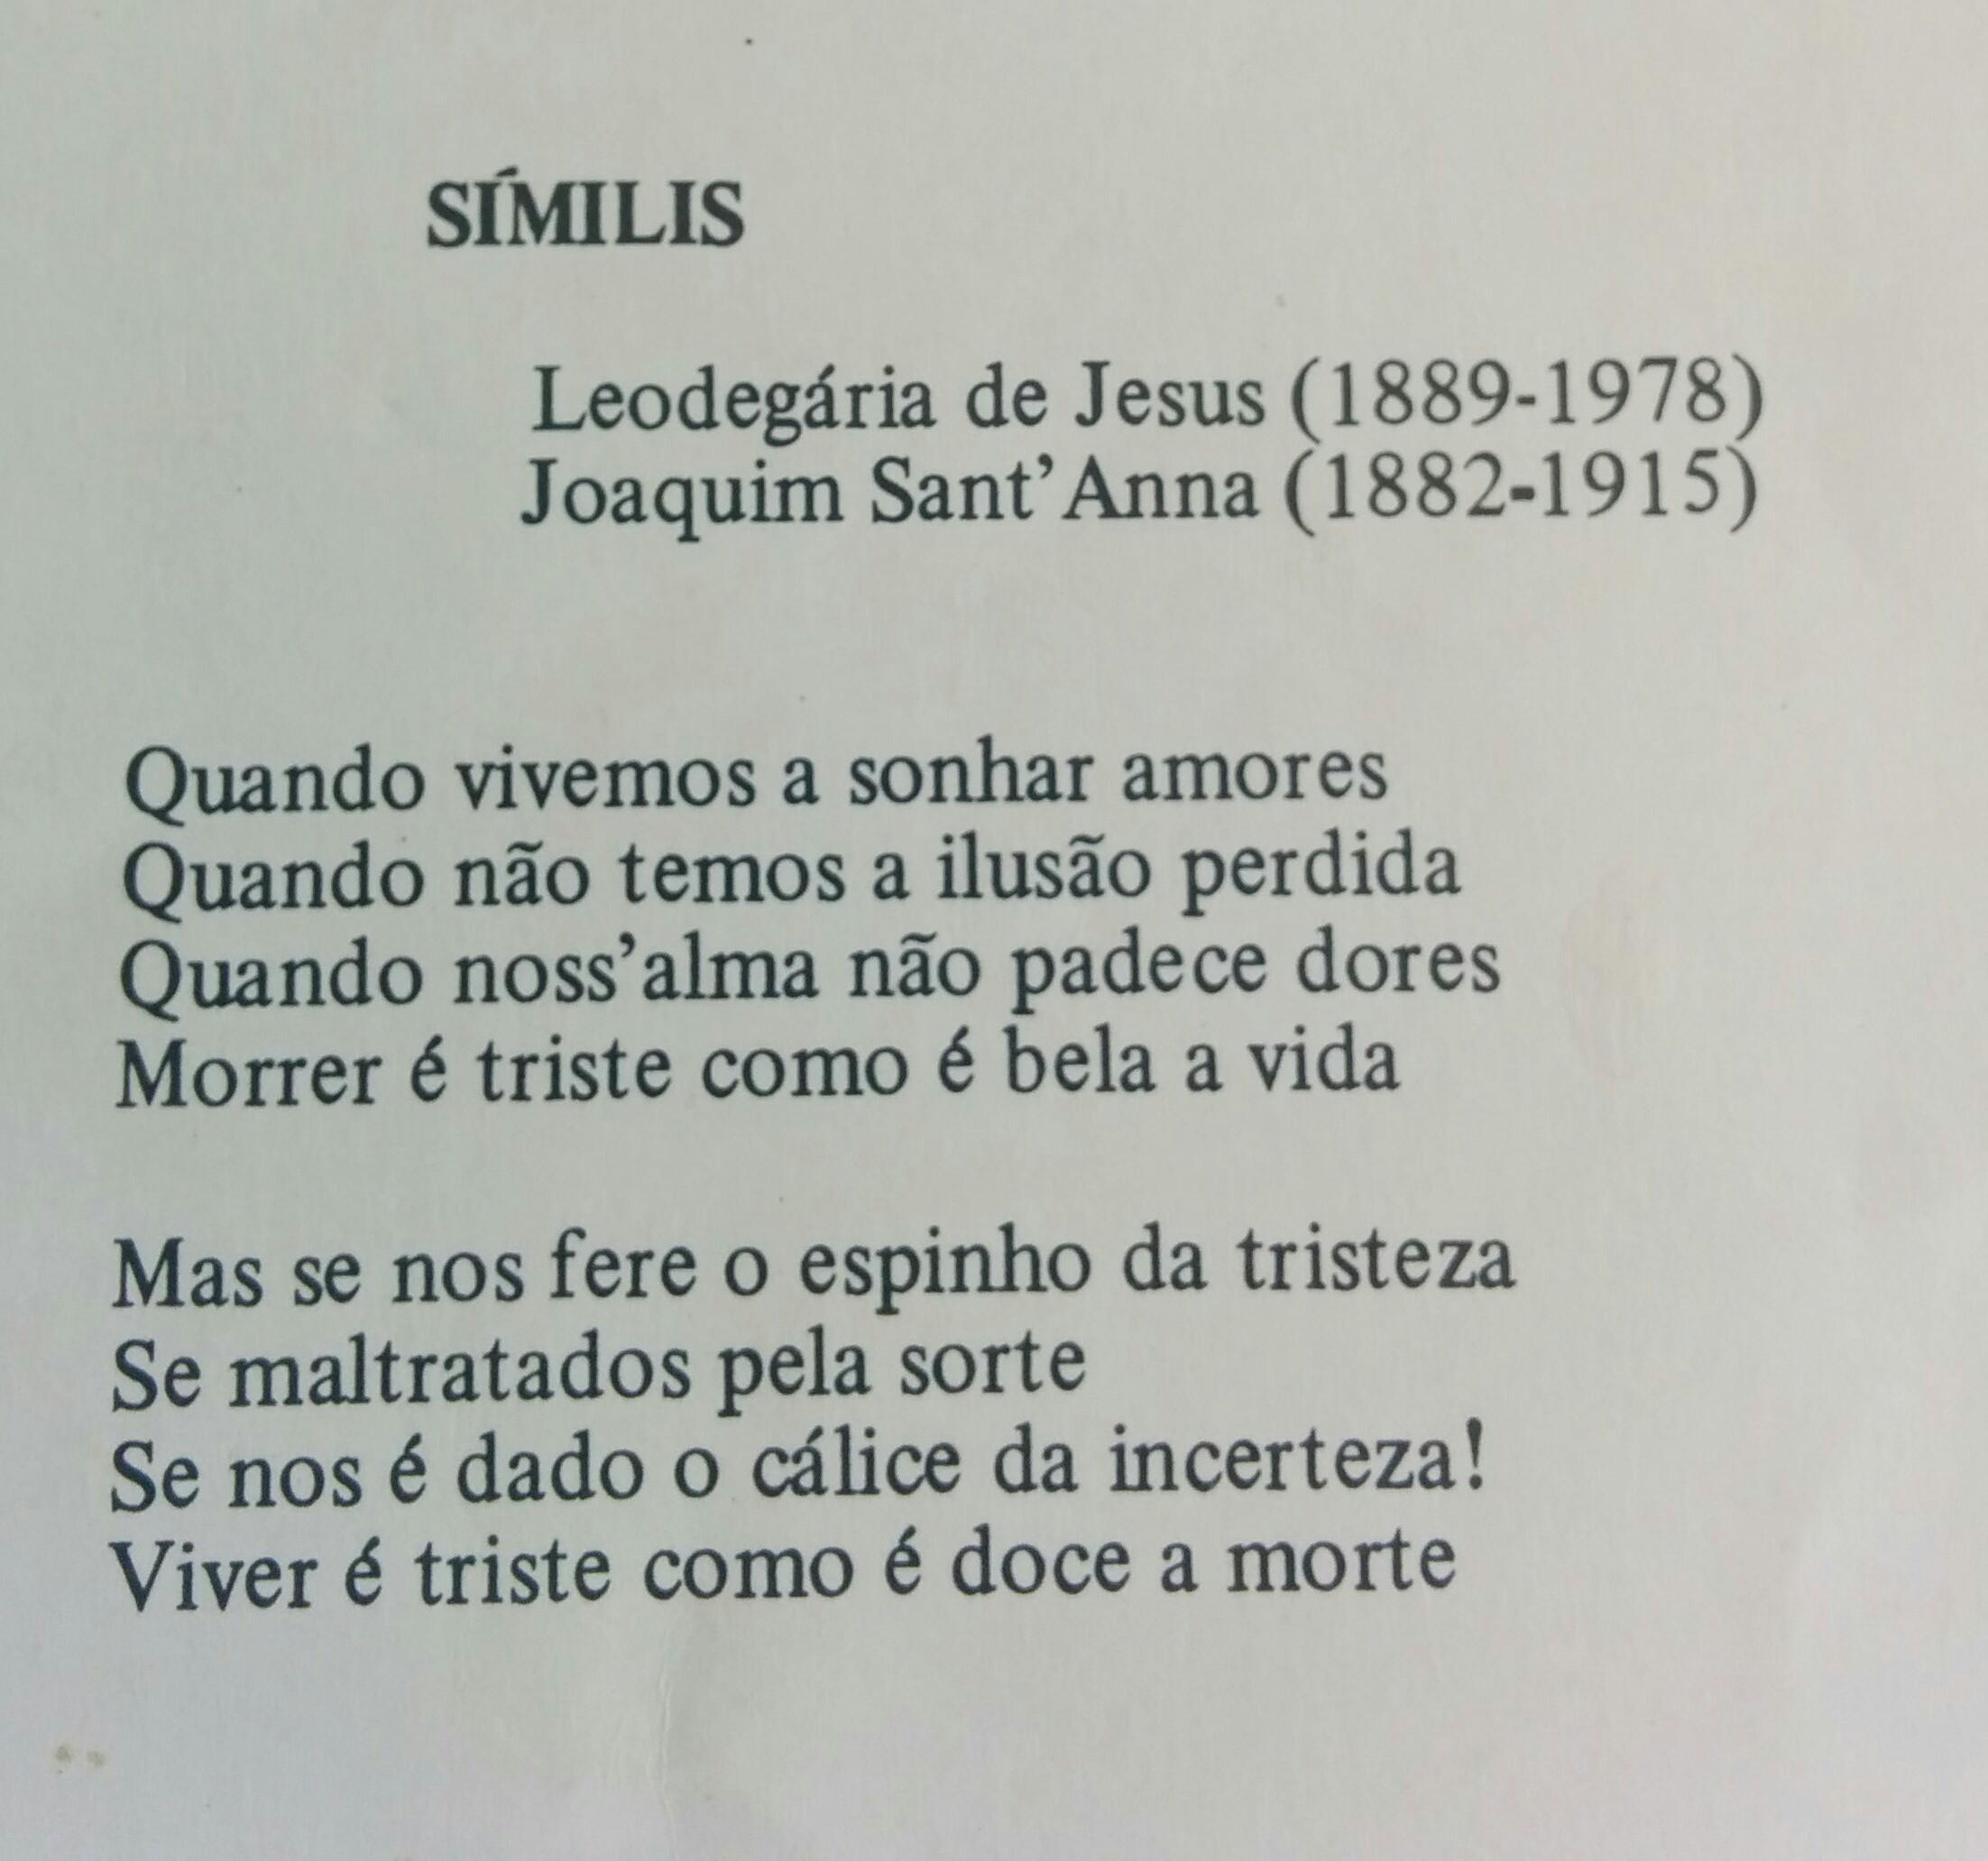 Símilis,